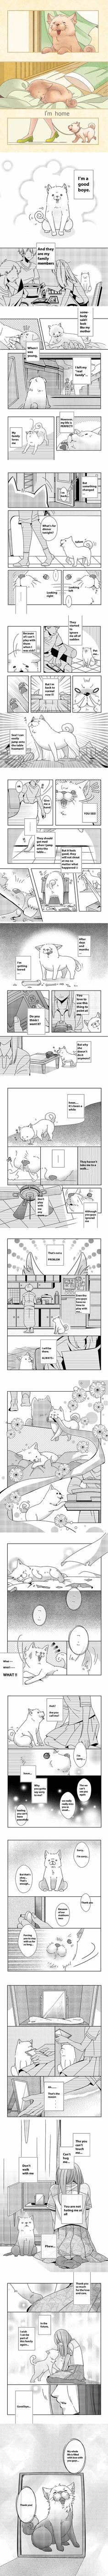 Life of a doggo